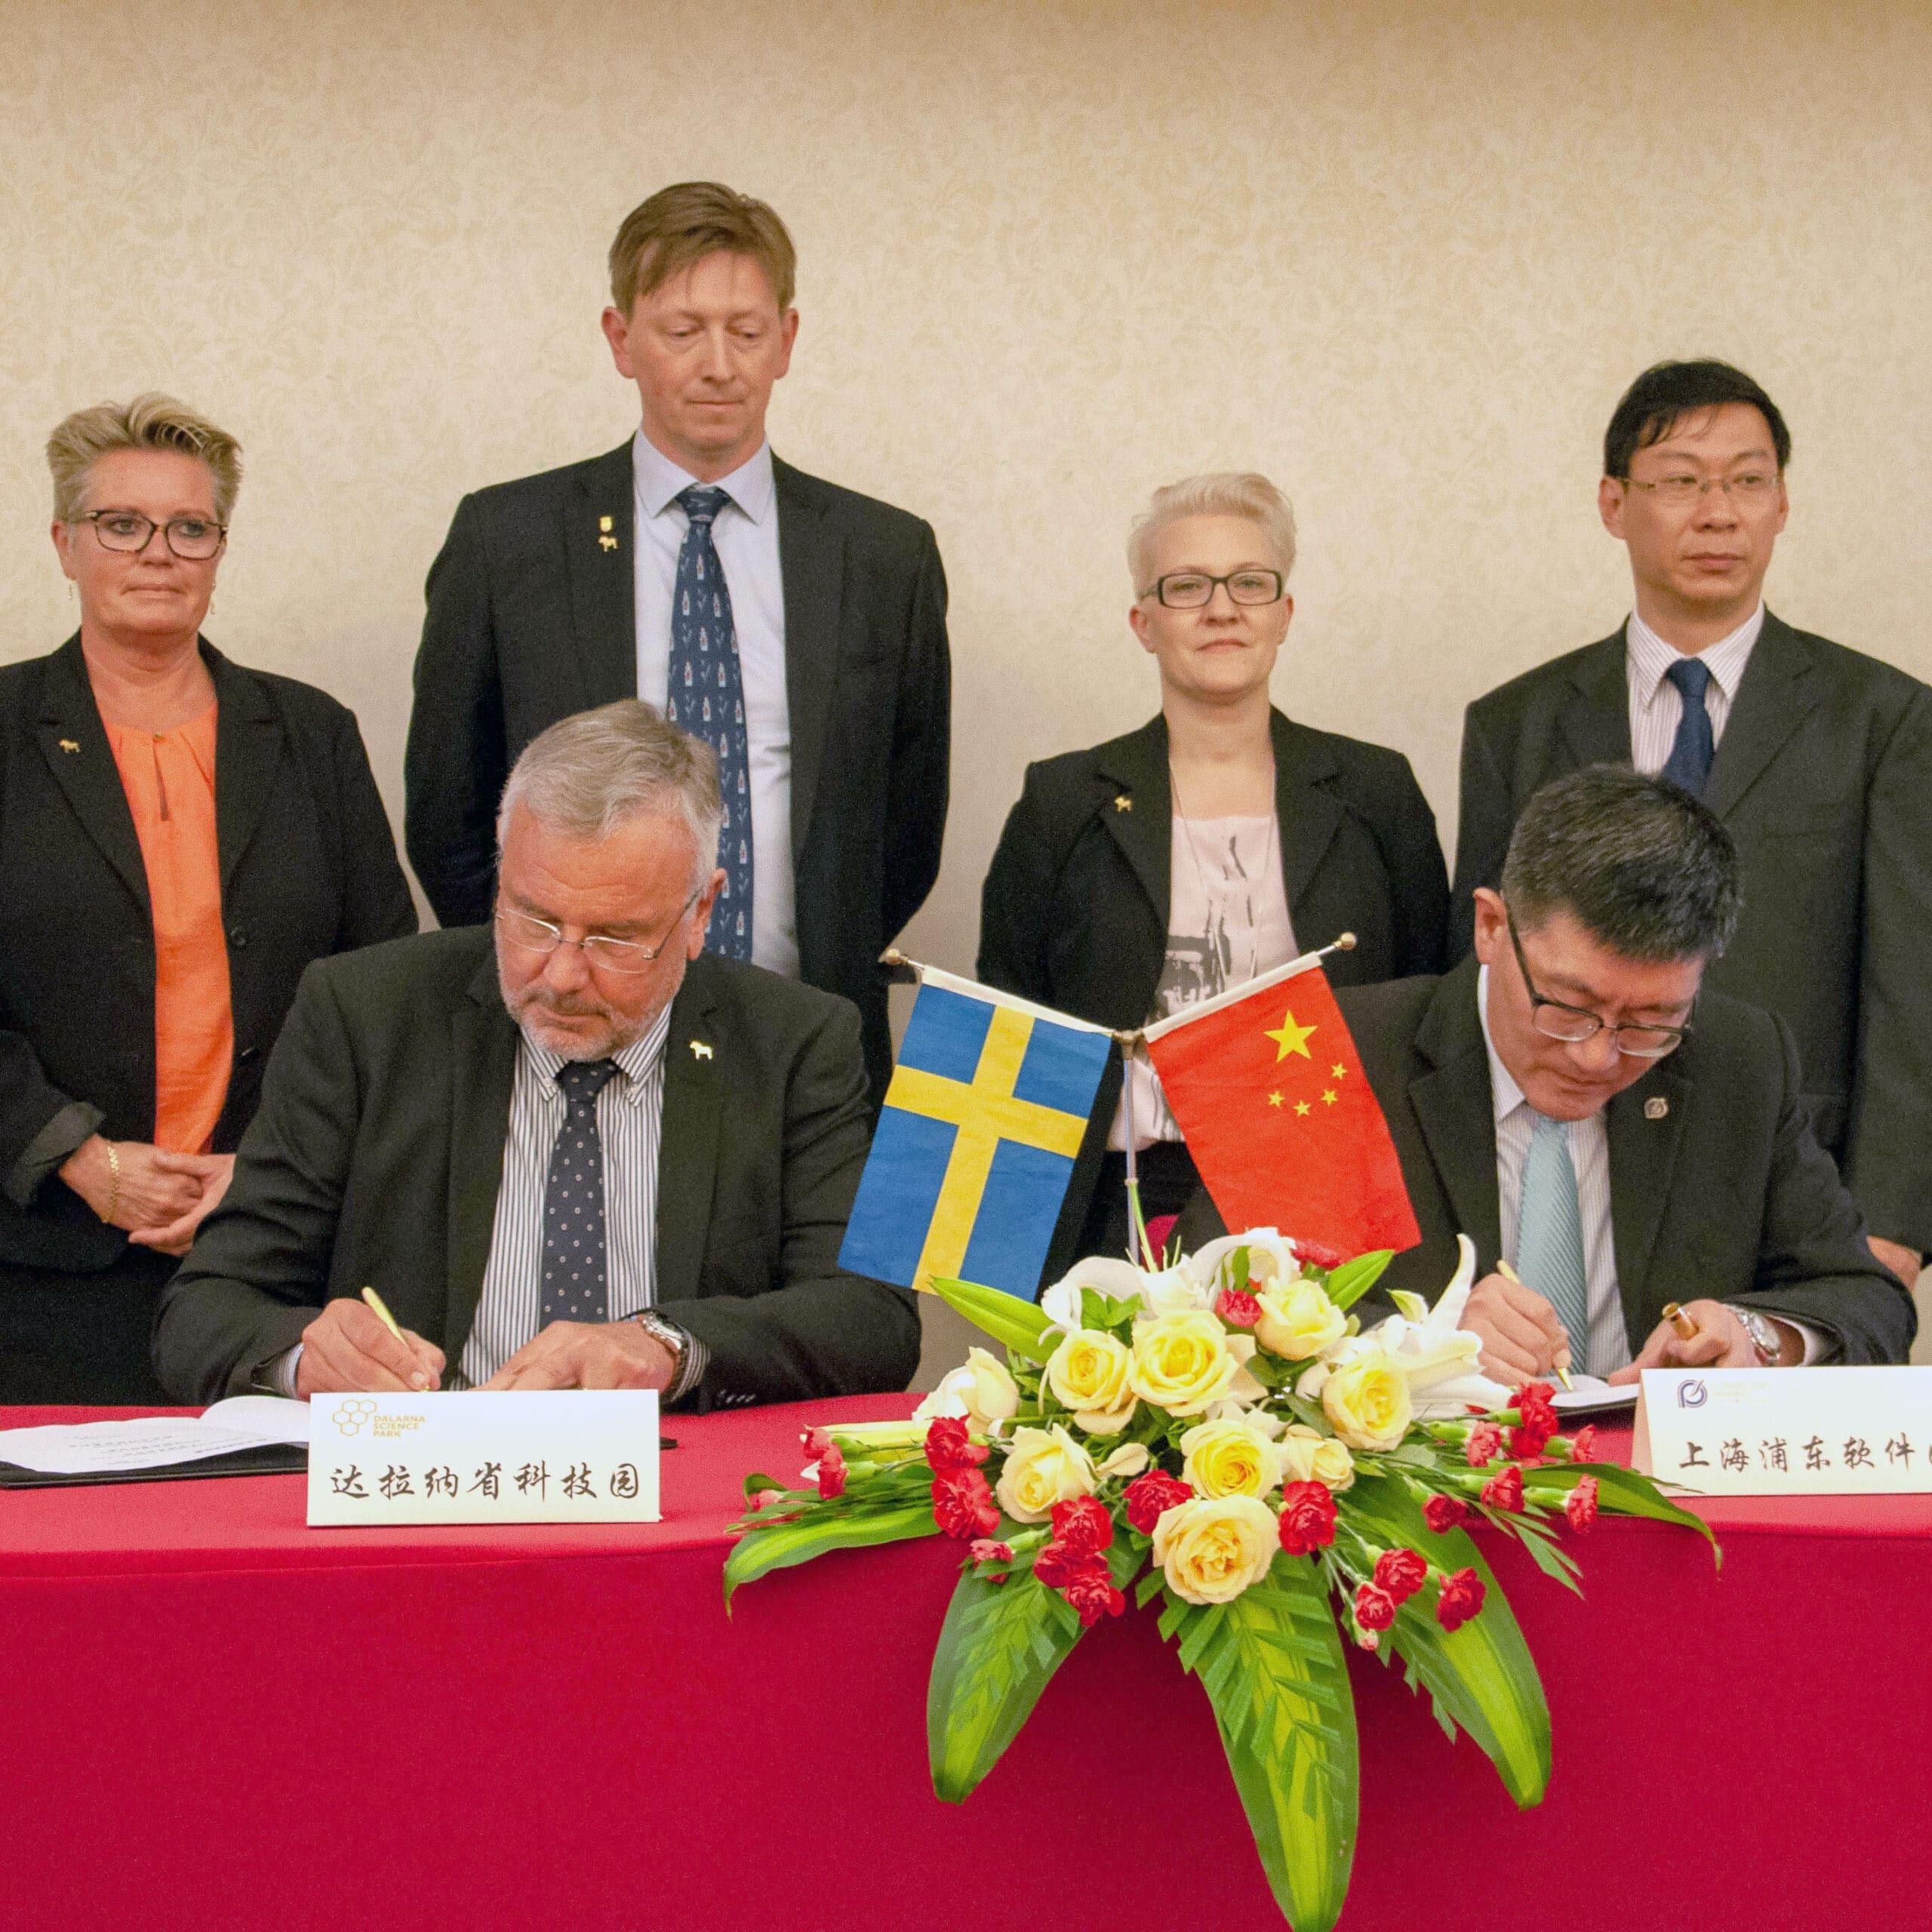 International cooperation between Dalarna Science Park and Shanghai